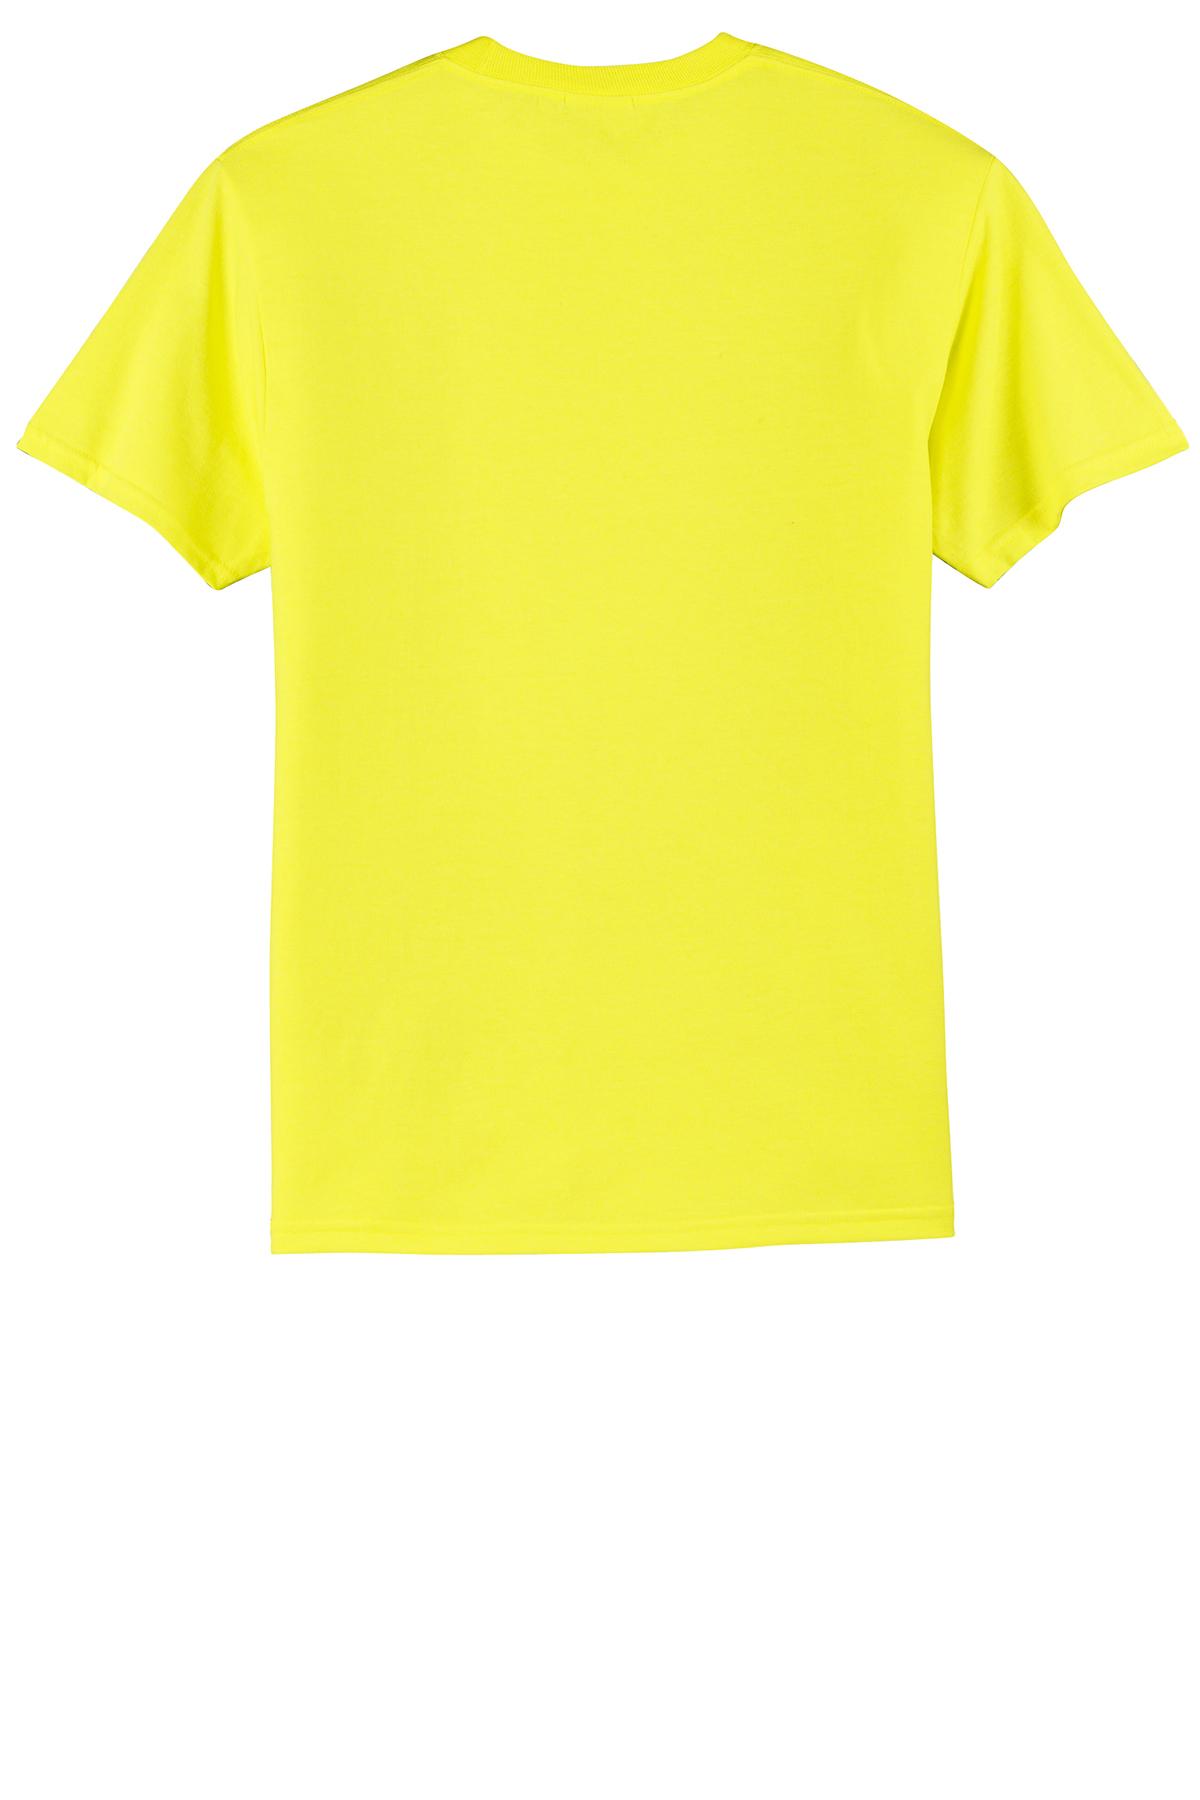 Port Company Core Blend Tee 5050 Blend T Shirts Sanmar